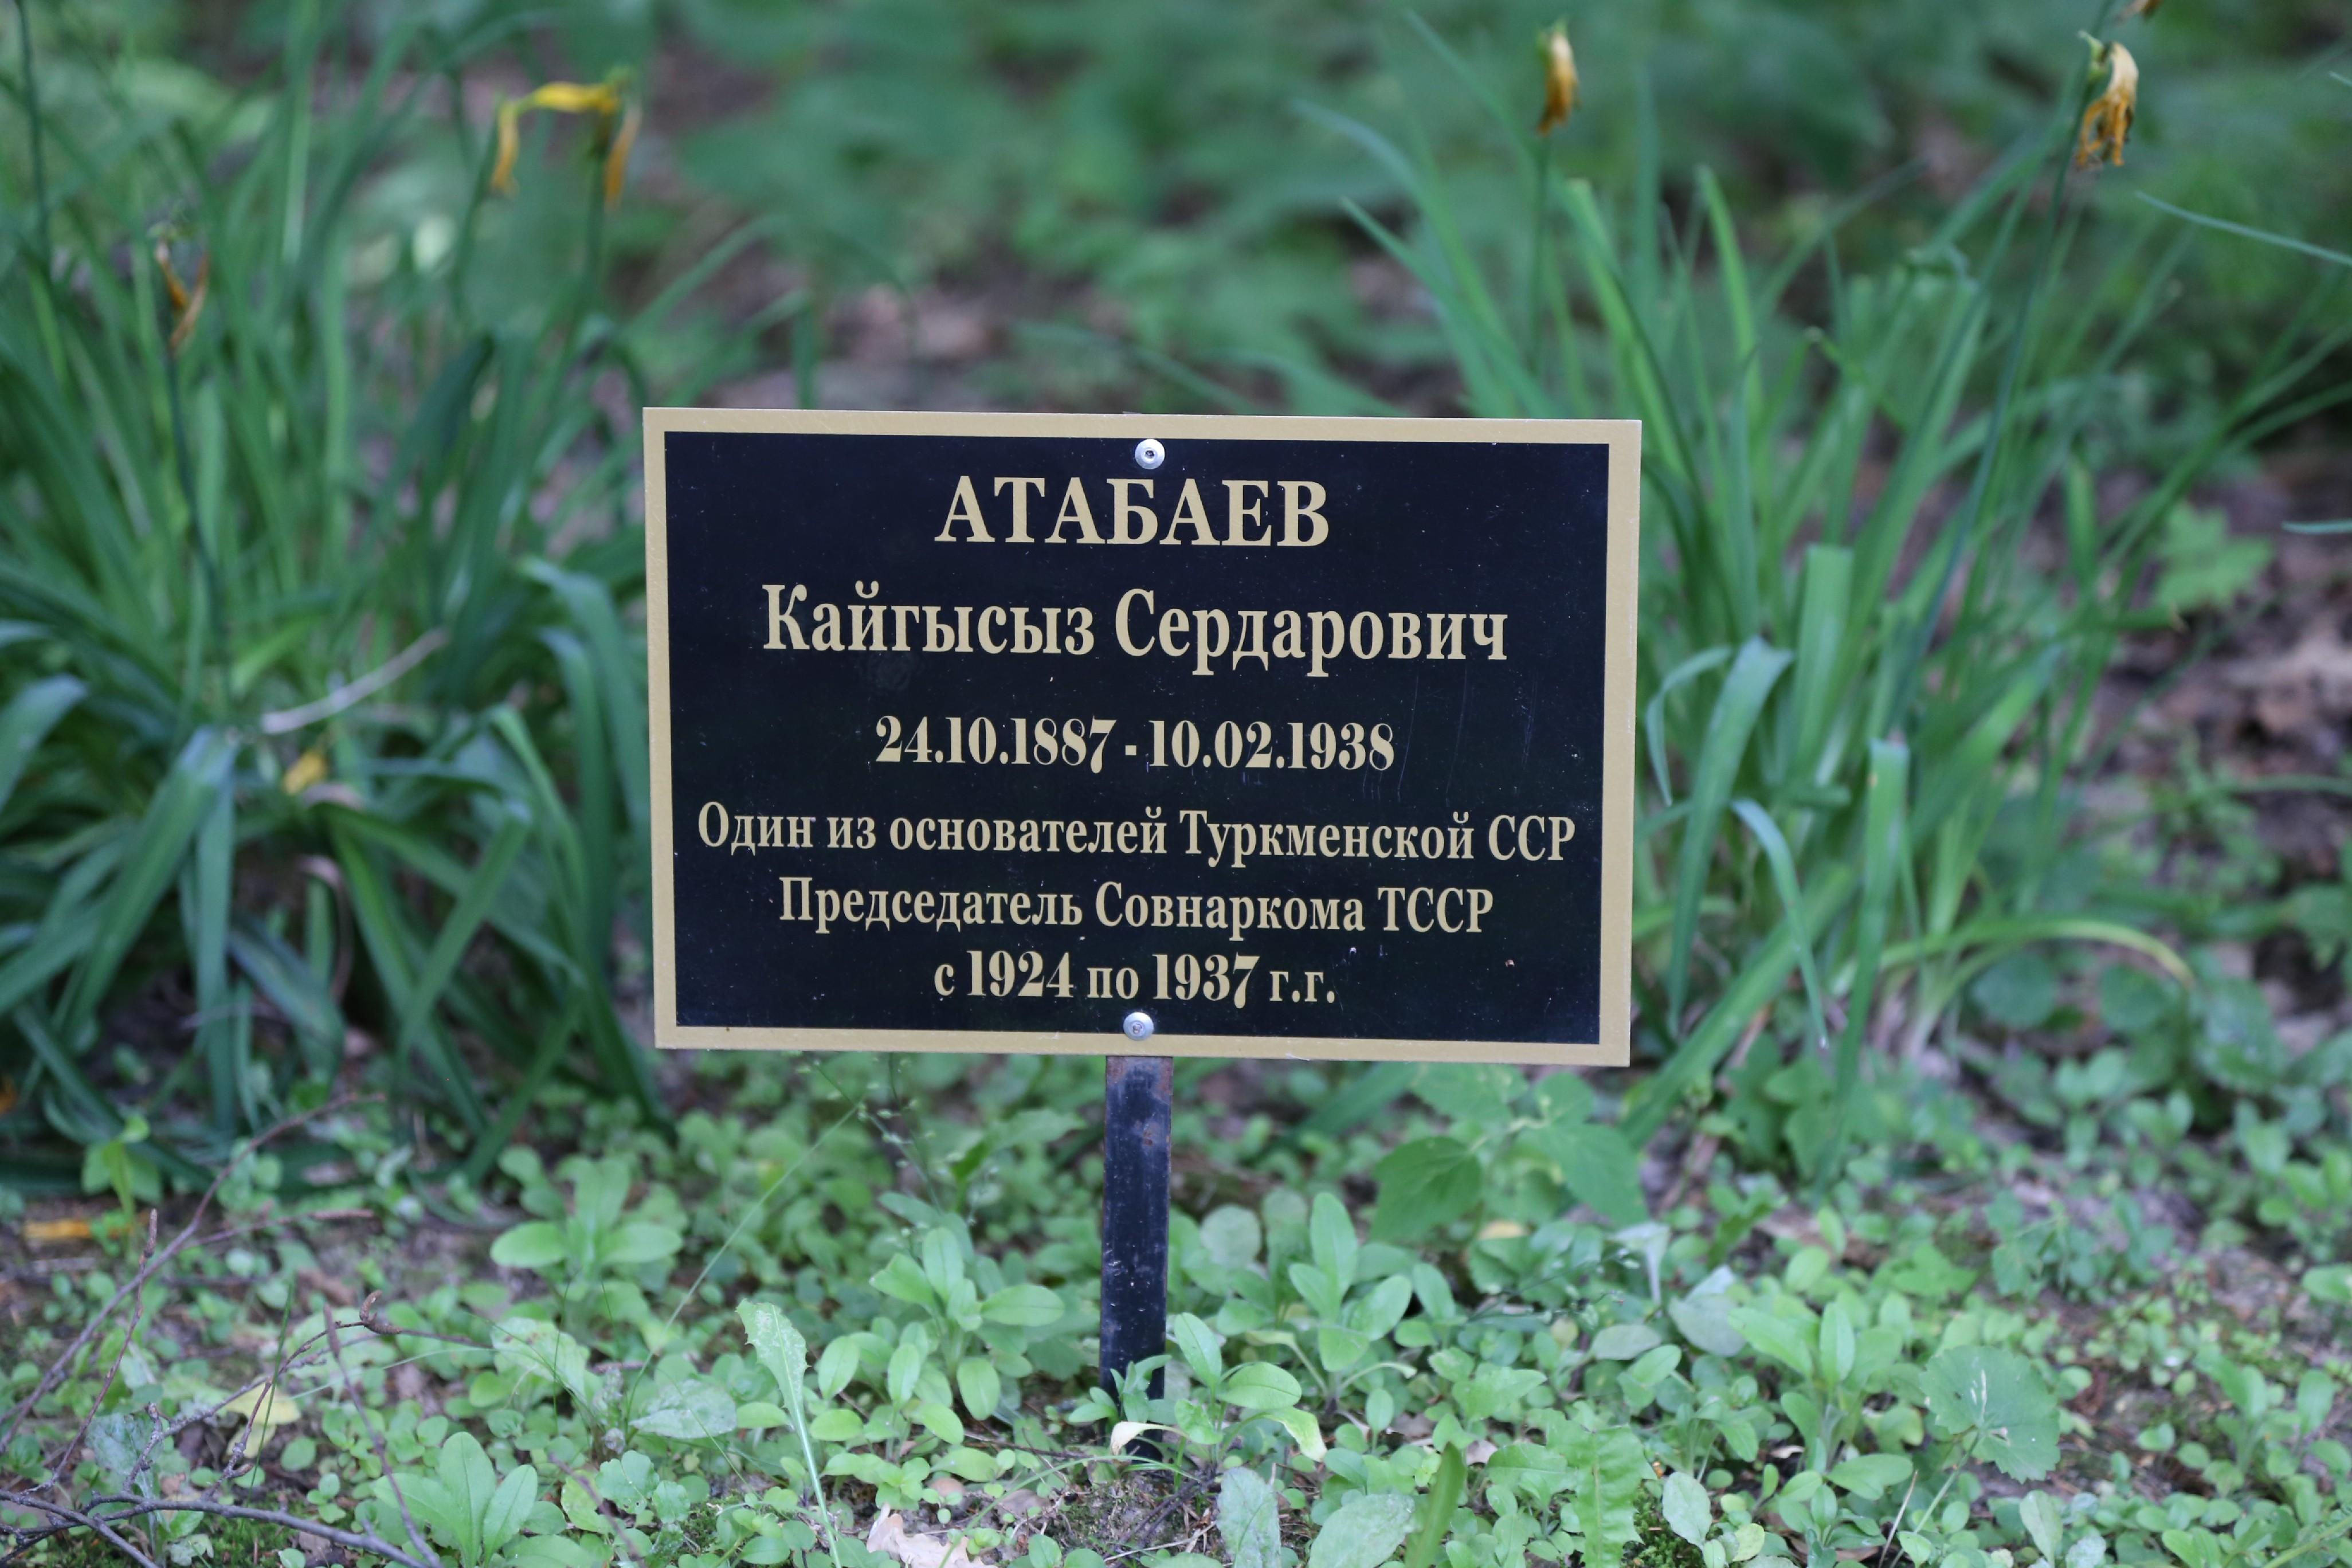 Памятная табличка К.С. Атабаеву. Фото 22.06.2018.